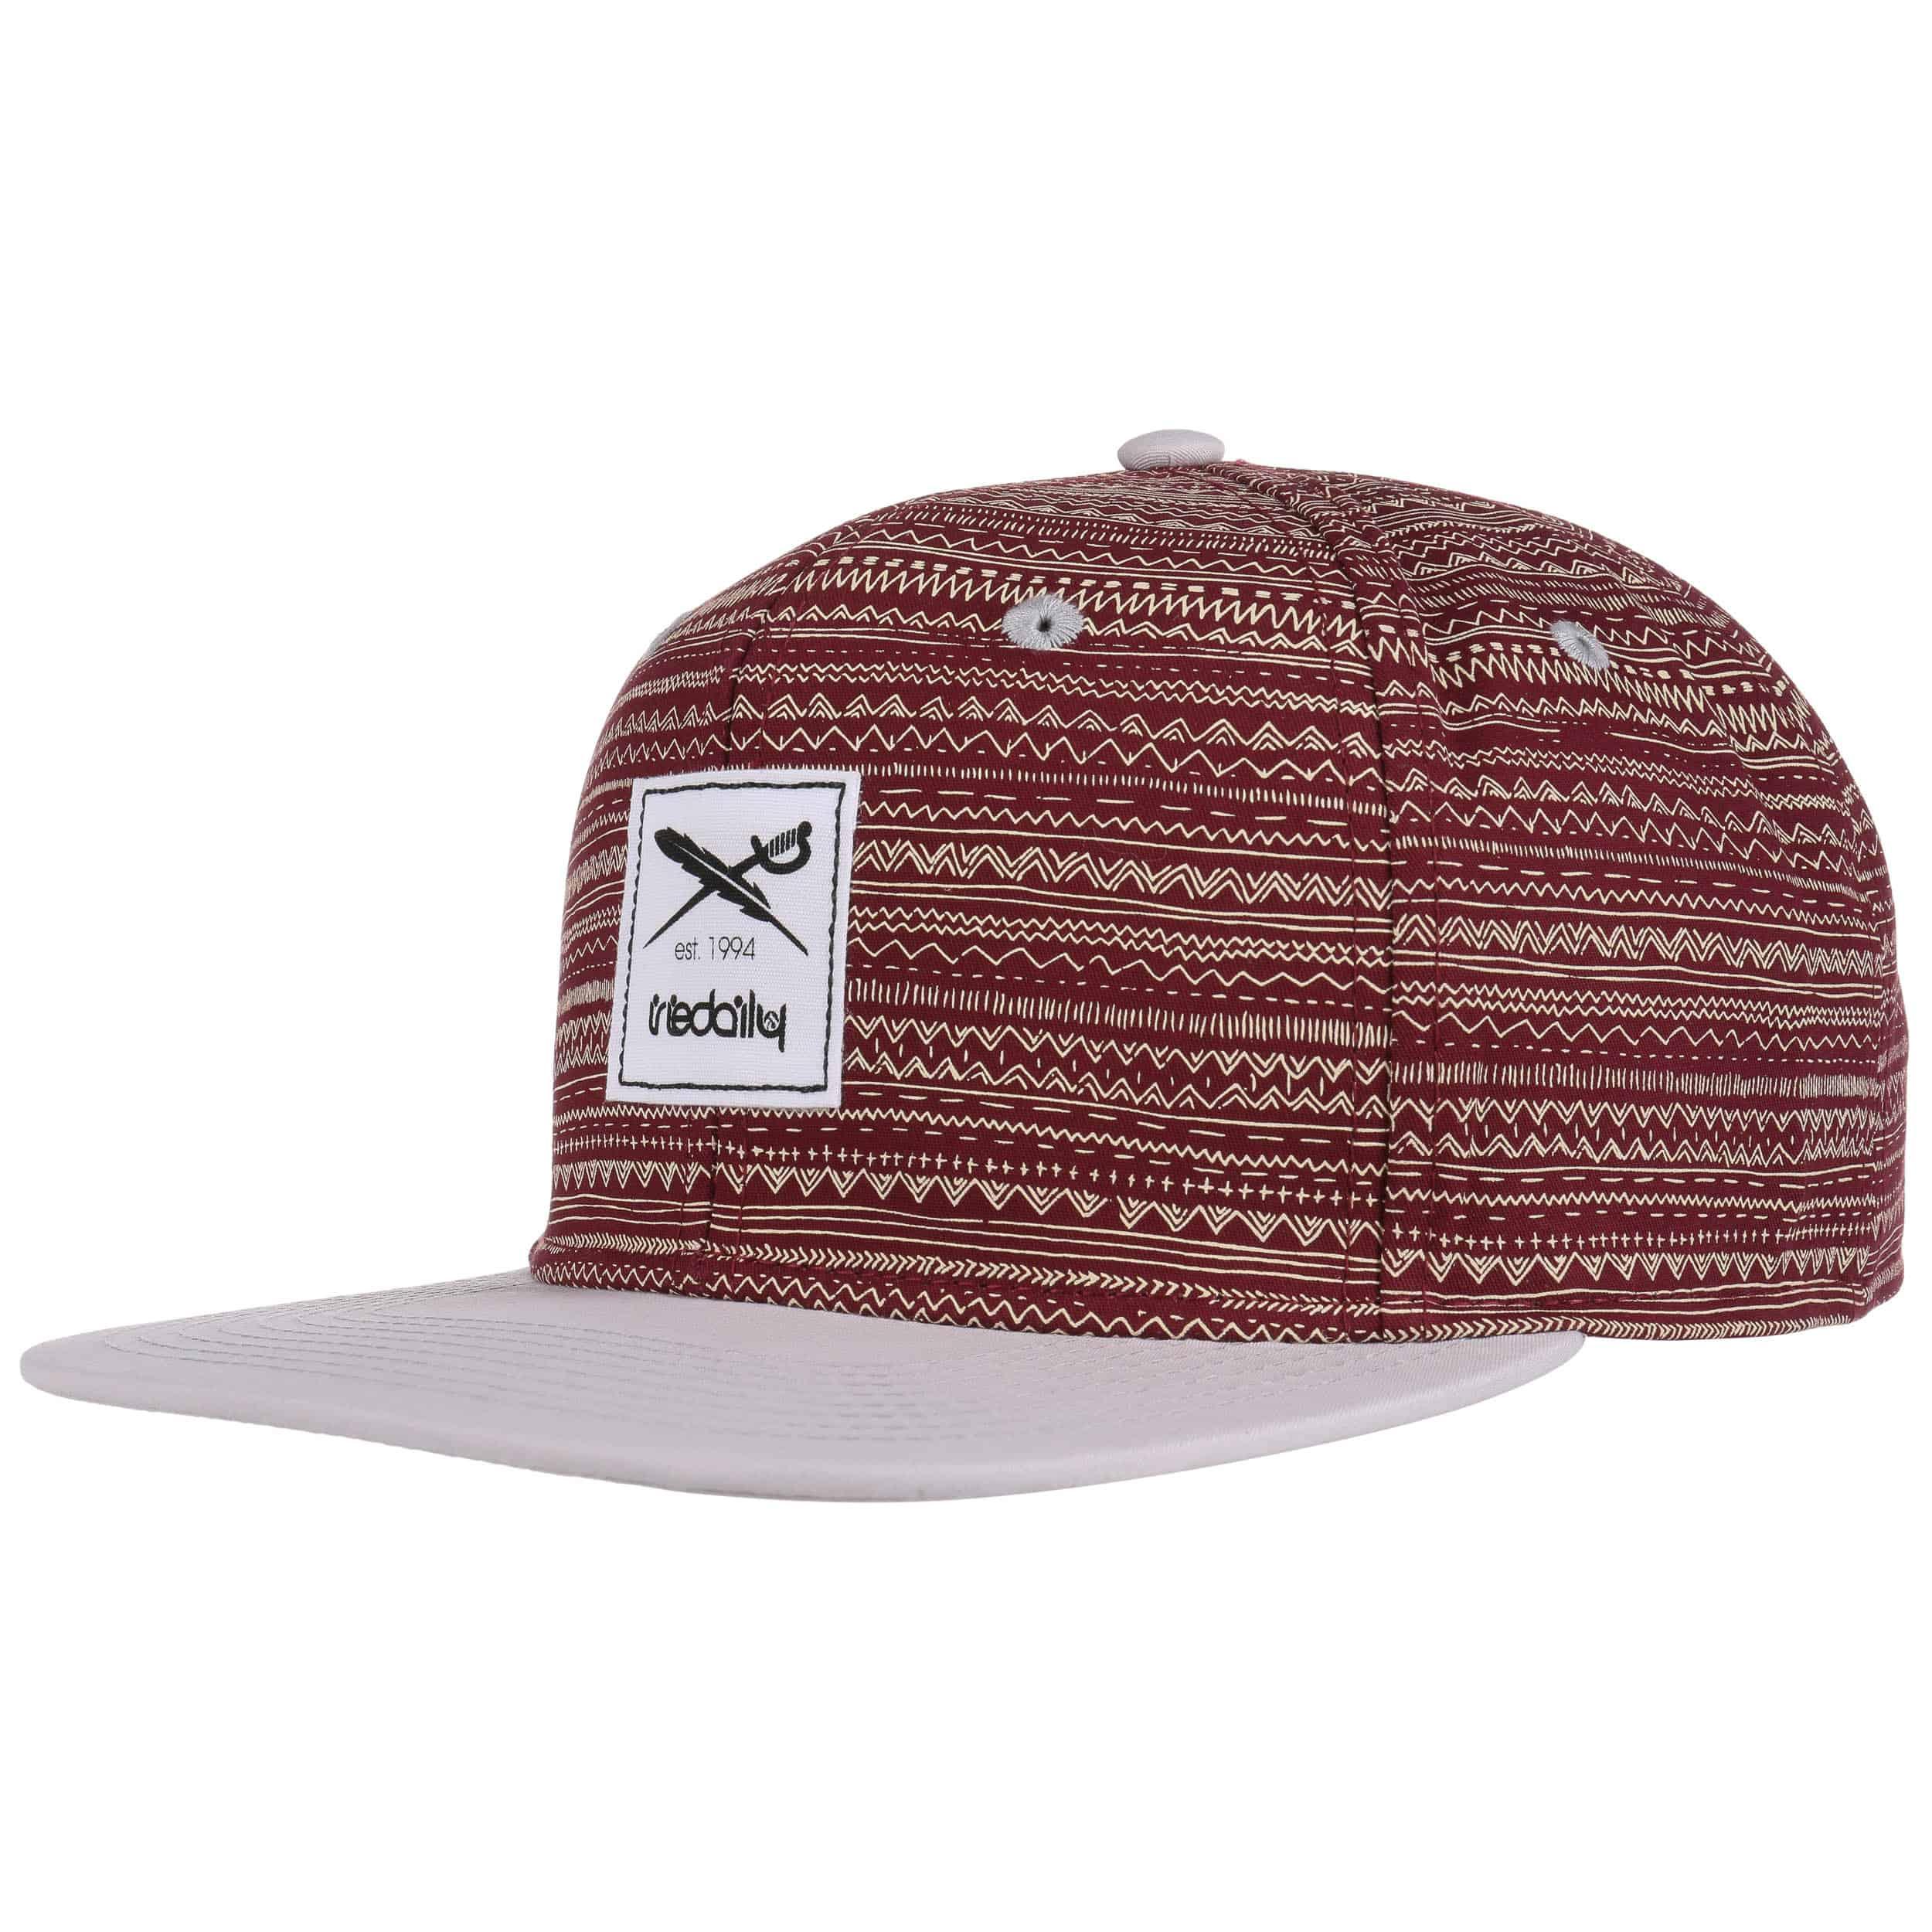 6c6ad3b0 La Banda Snapback Cap by iriedaily, EUR 29,95 --> Hats, caps ...